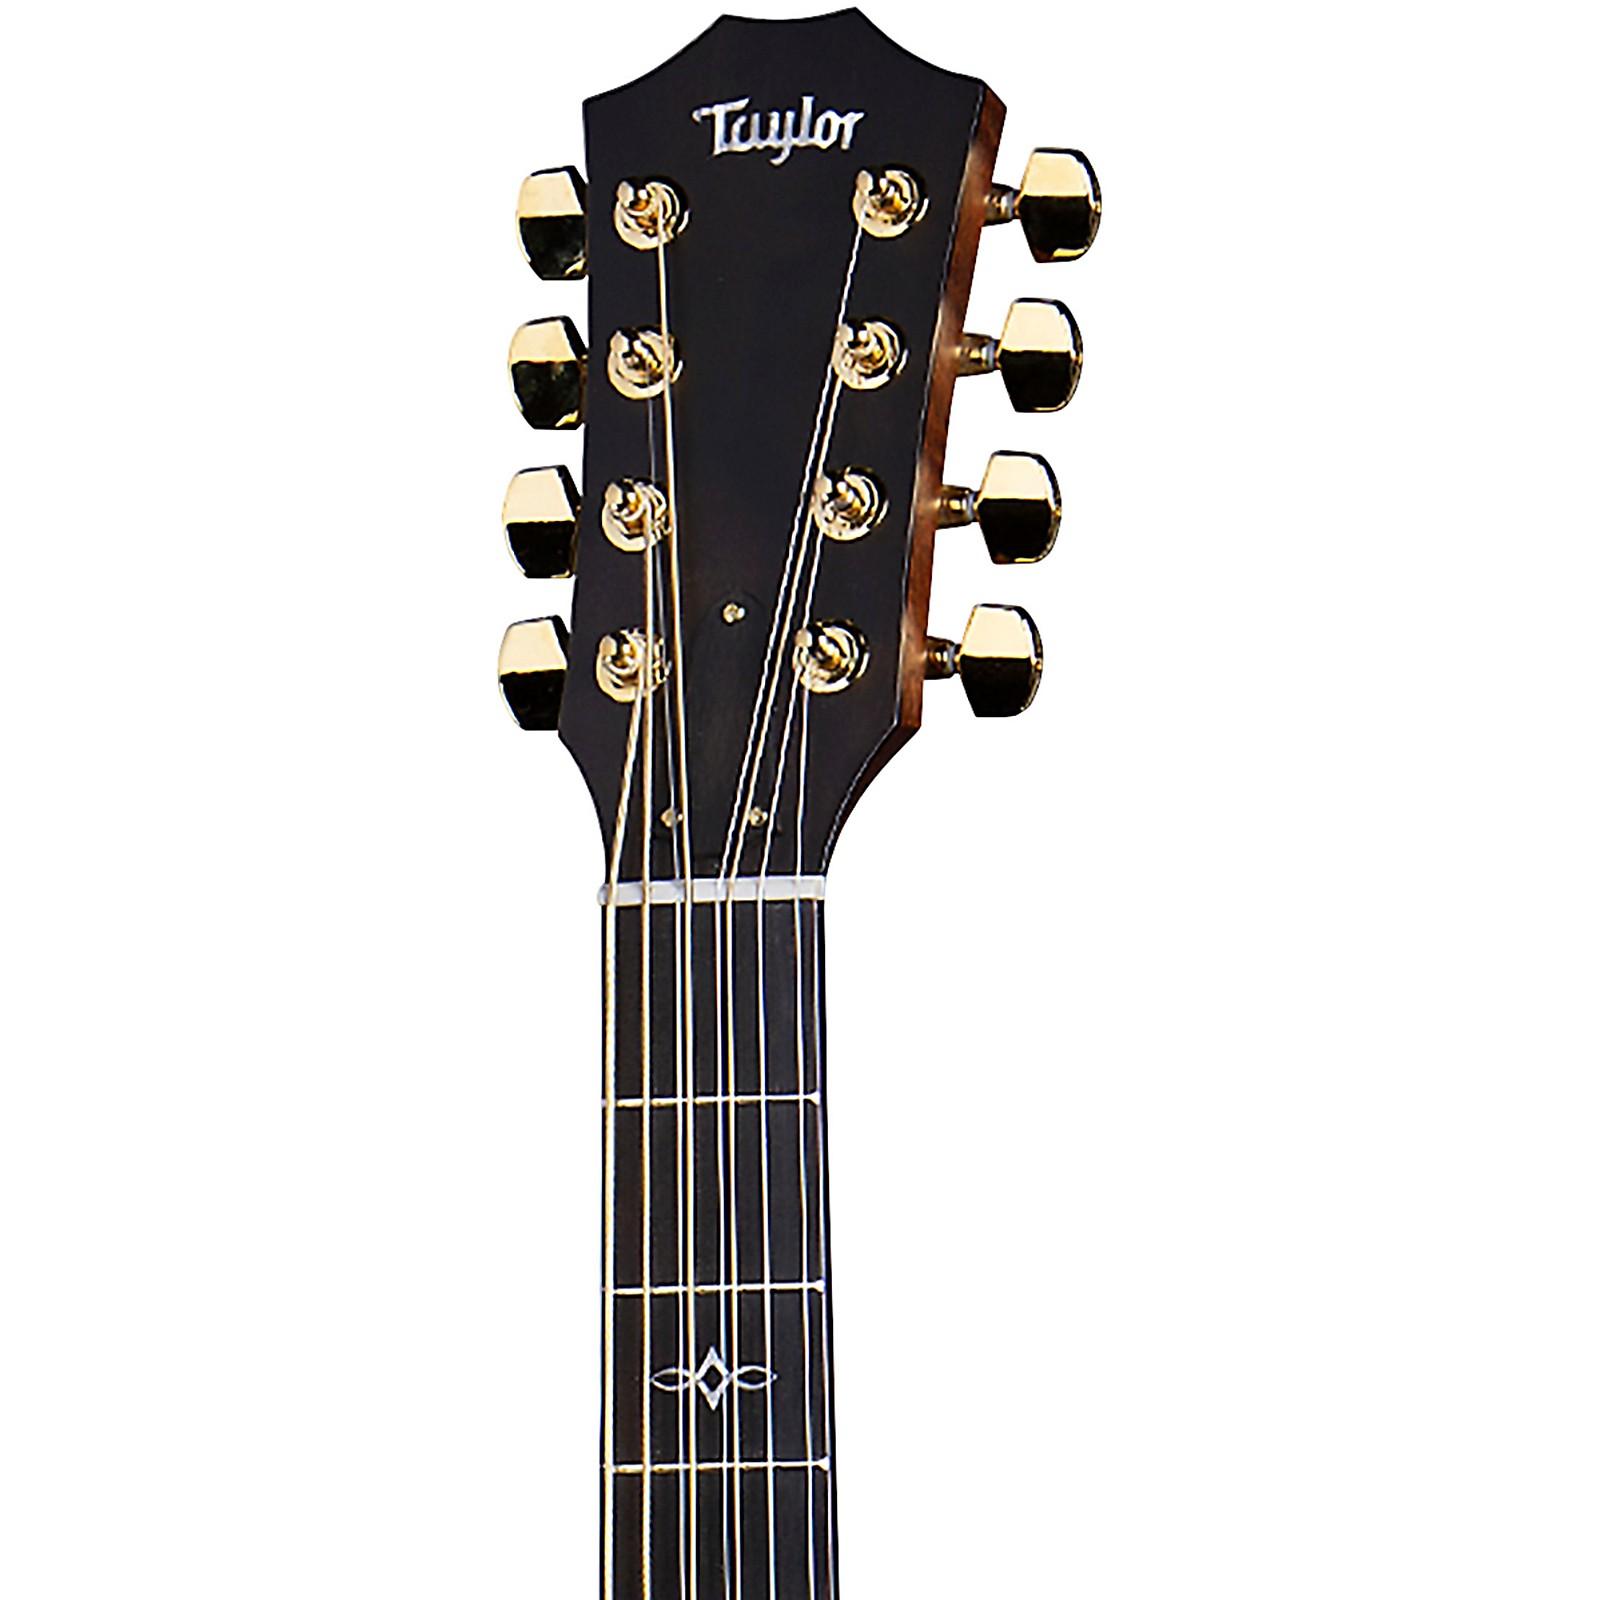 Taylor 316e-Baritone-8 Limited Edition Baritone 8-String Grand Symphony Acoustic-Electric Guitar